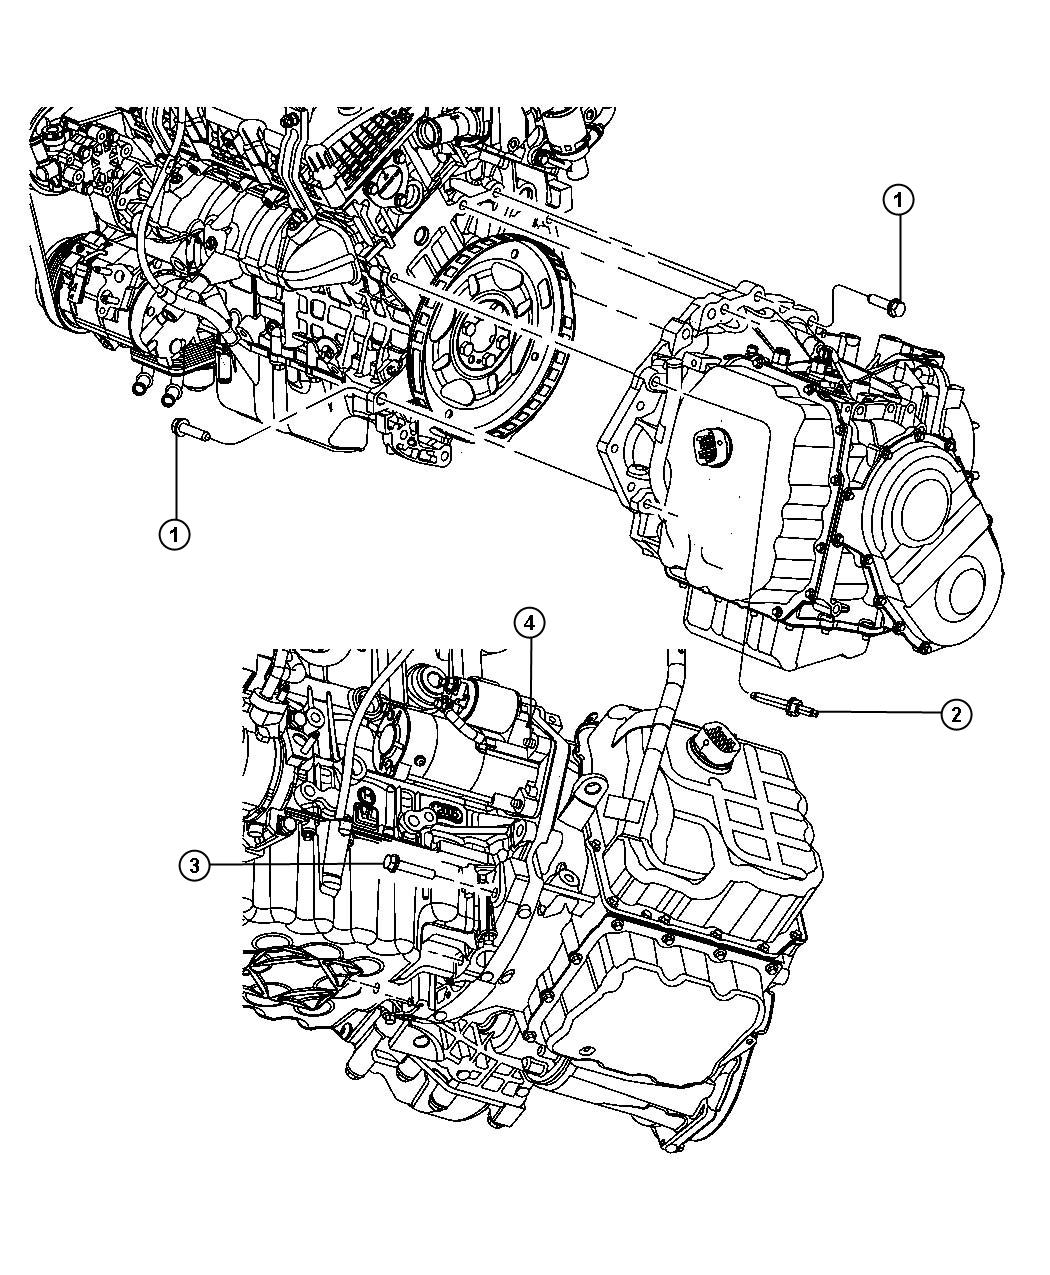 2013 Dodge Ram 3500 Plug. Terminal, fuse, battery